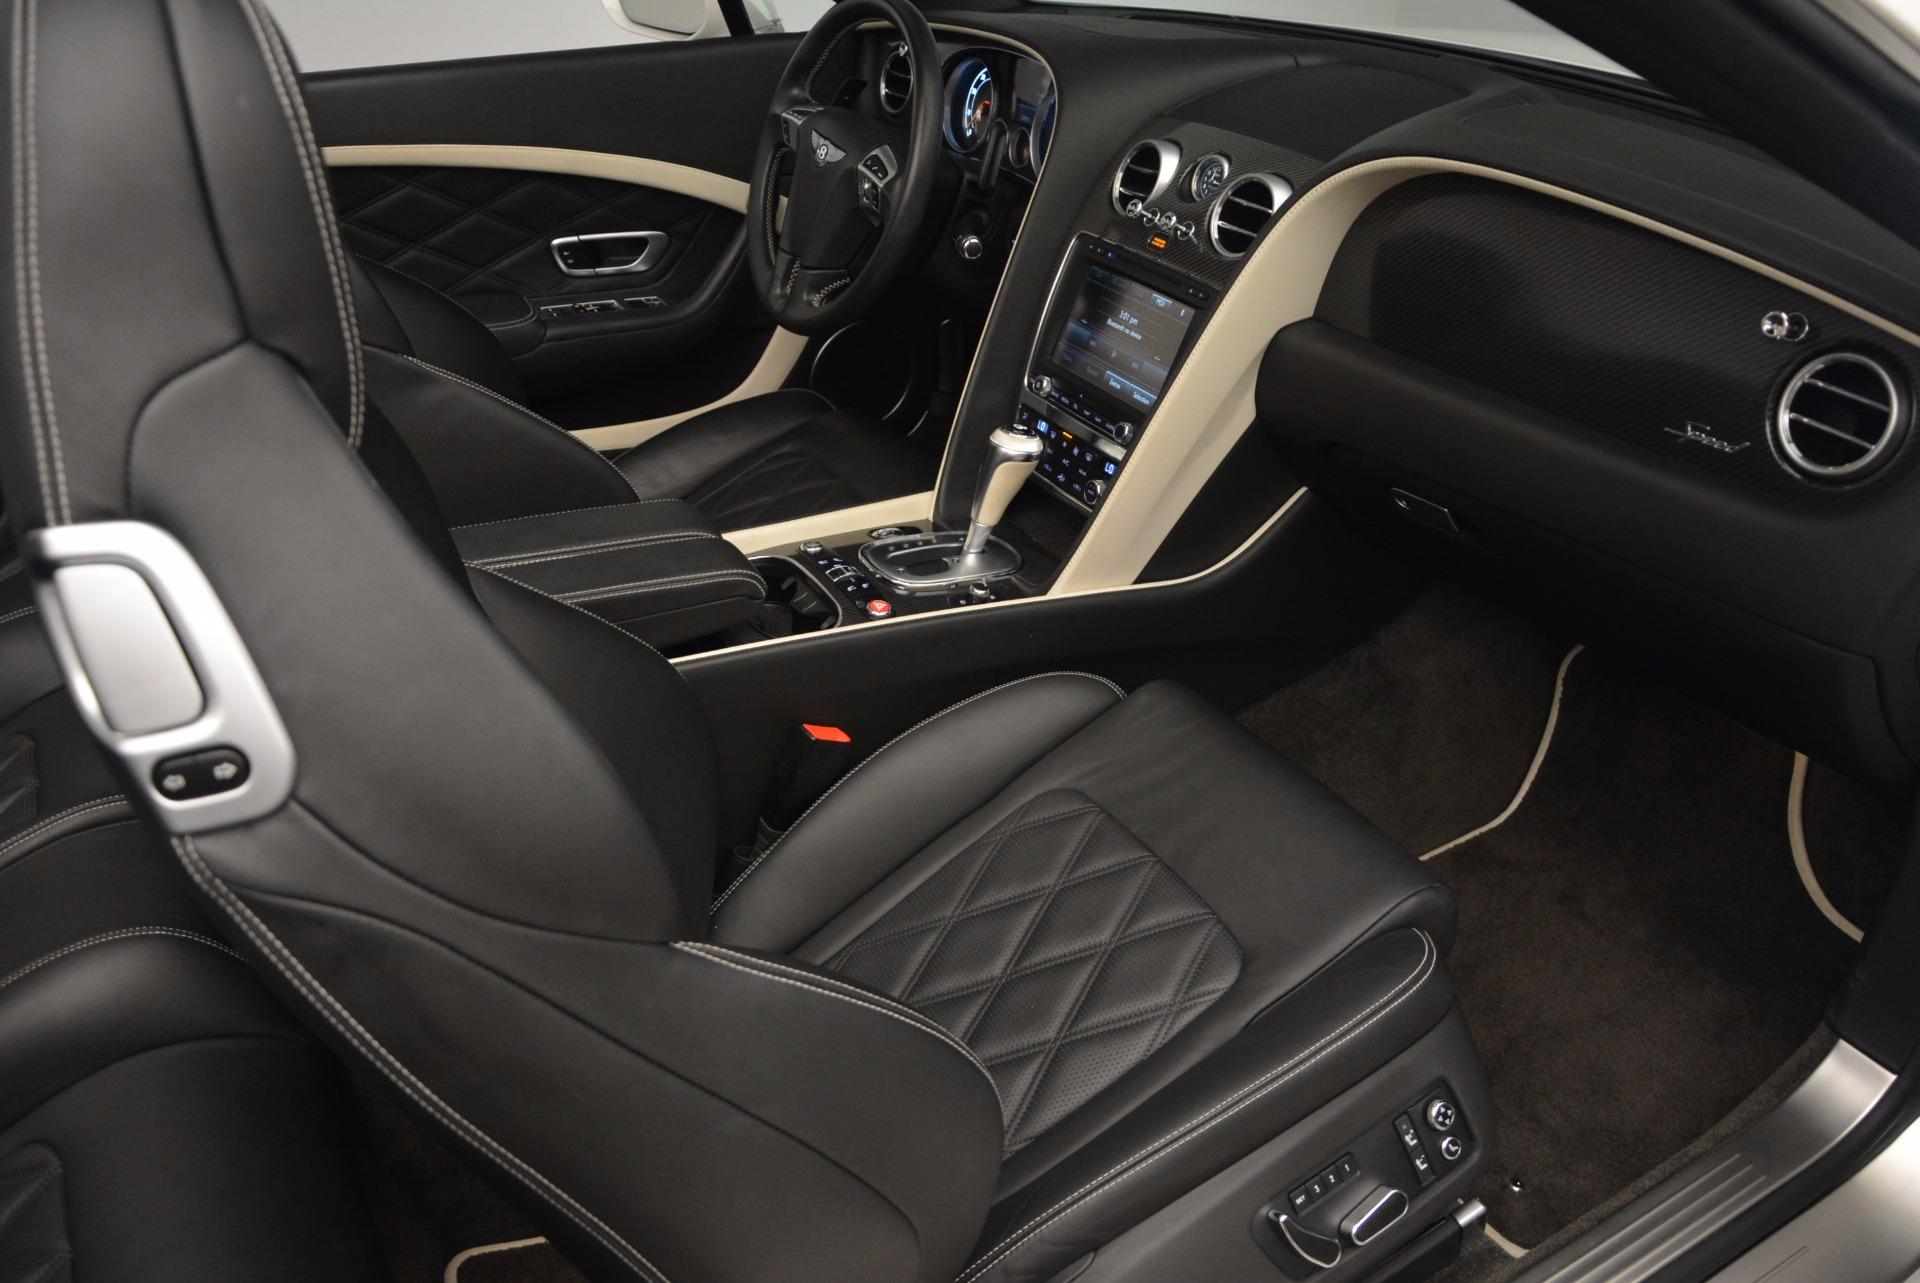 Used 2015 Bentley Continental GT Speed For Sale In Westport, CT 1714_p44